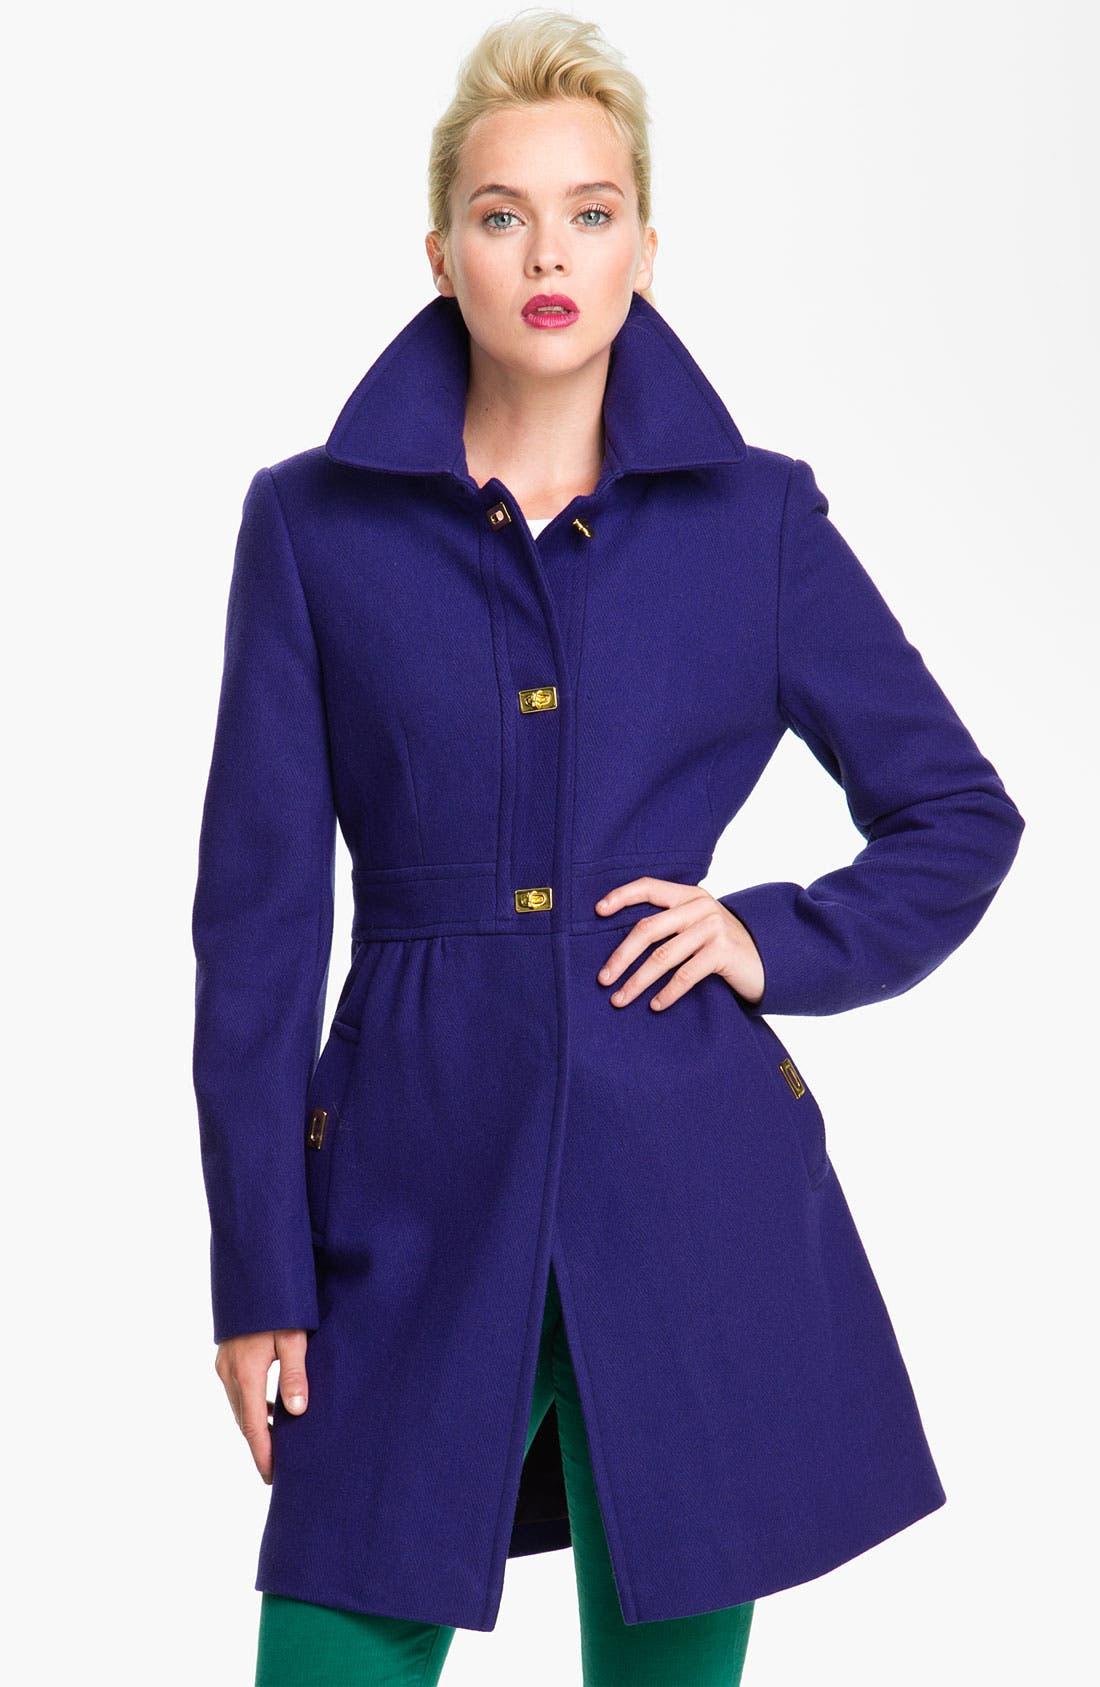 Main Image - DKNY 'Kendra' Turnkey Wool Blend Coat (Nordstrom Exclusive)